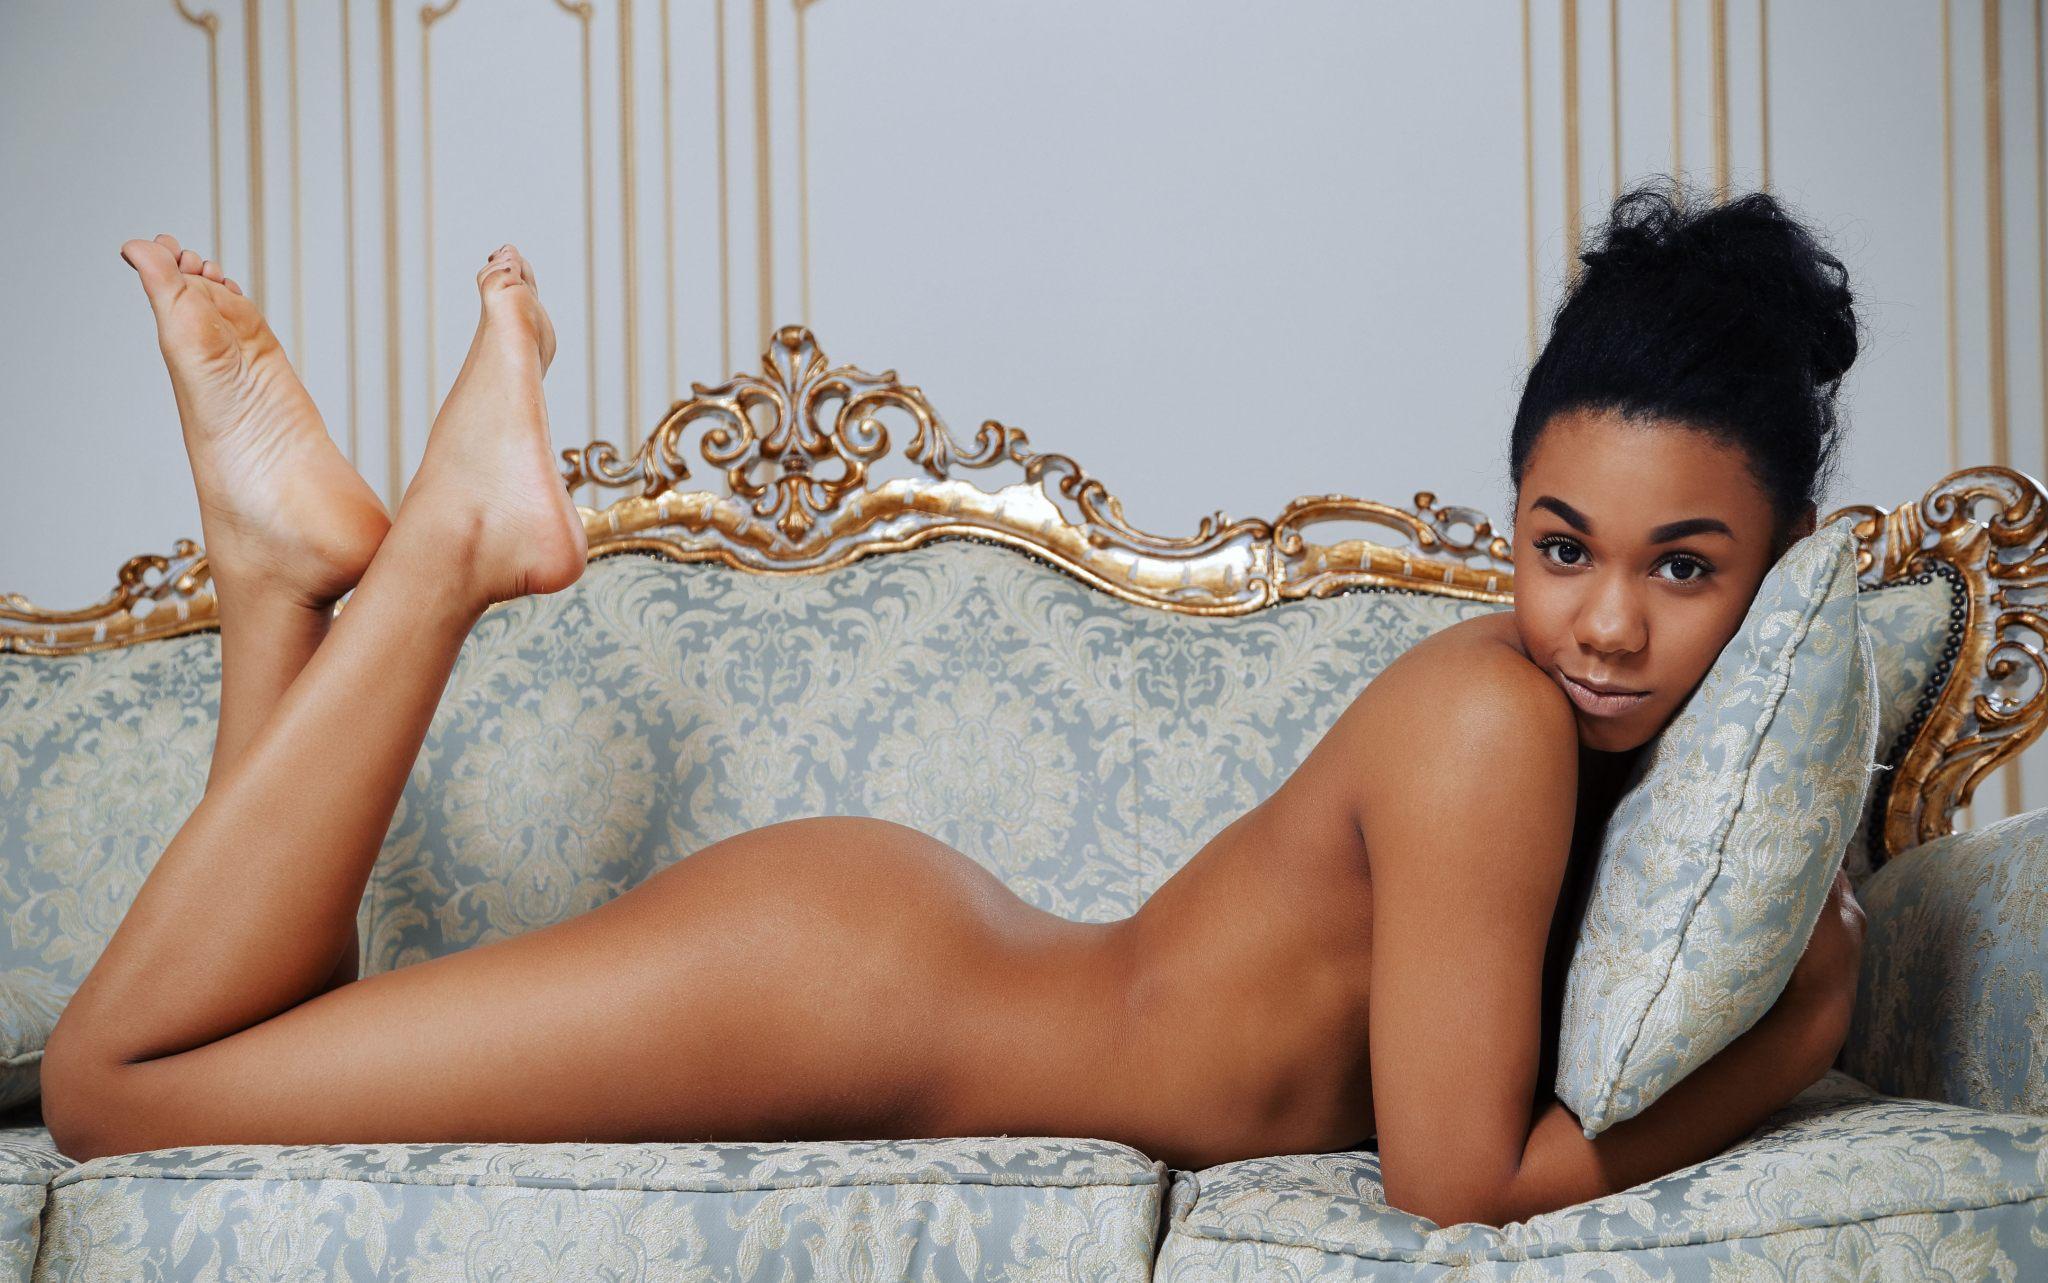 Gana nude in erotic odepi gallery